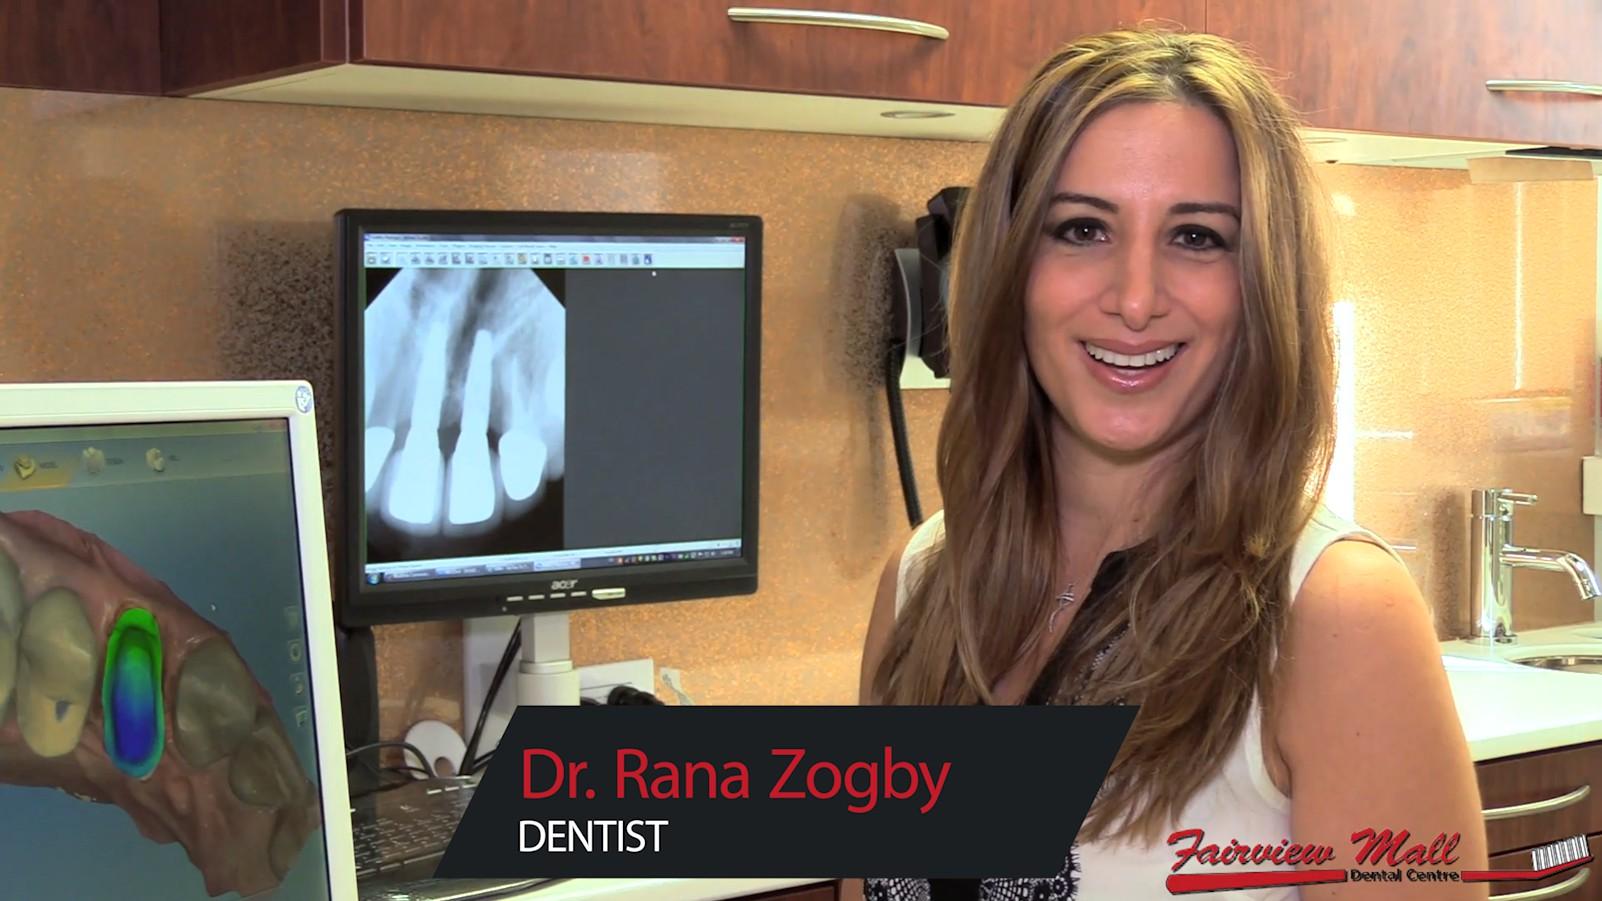 Fairview Mall Dental Centre - Dentistes - 416-491-1100